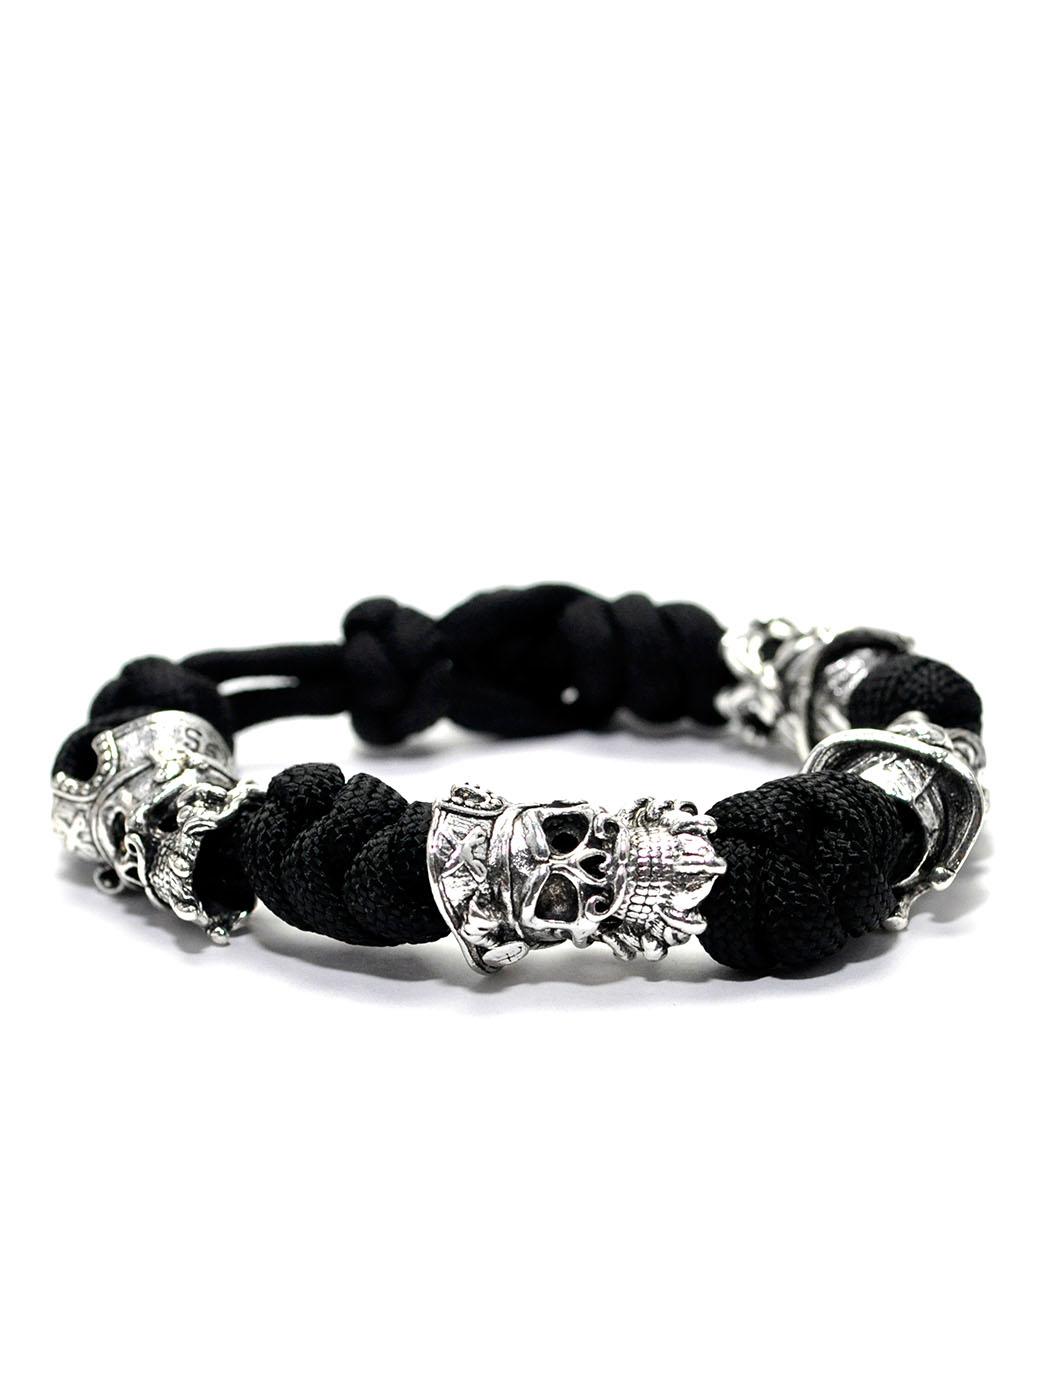 Blackbeard Bracelet Black, Norse Leather Bracelet